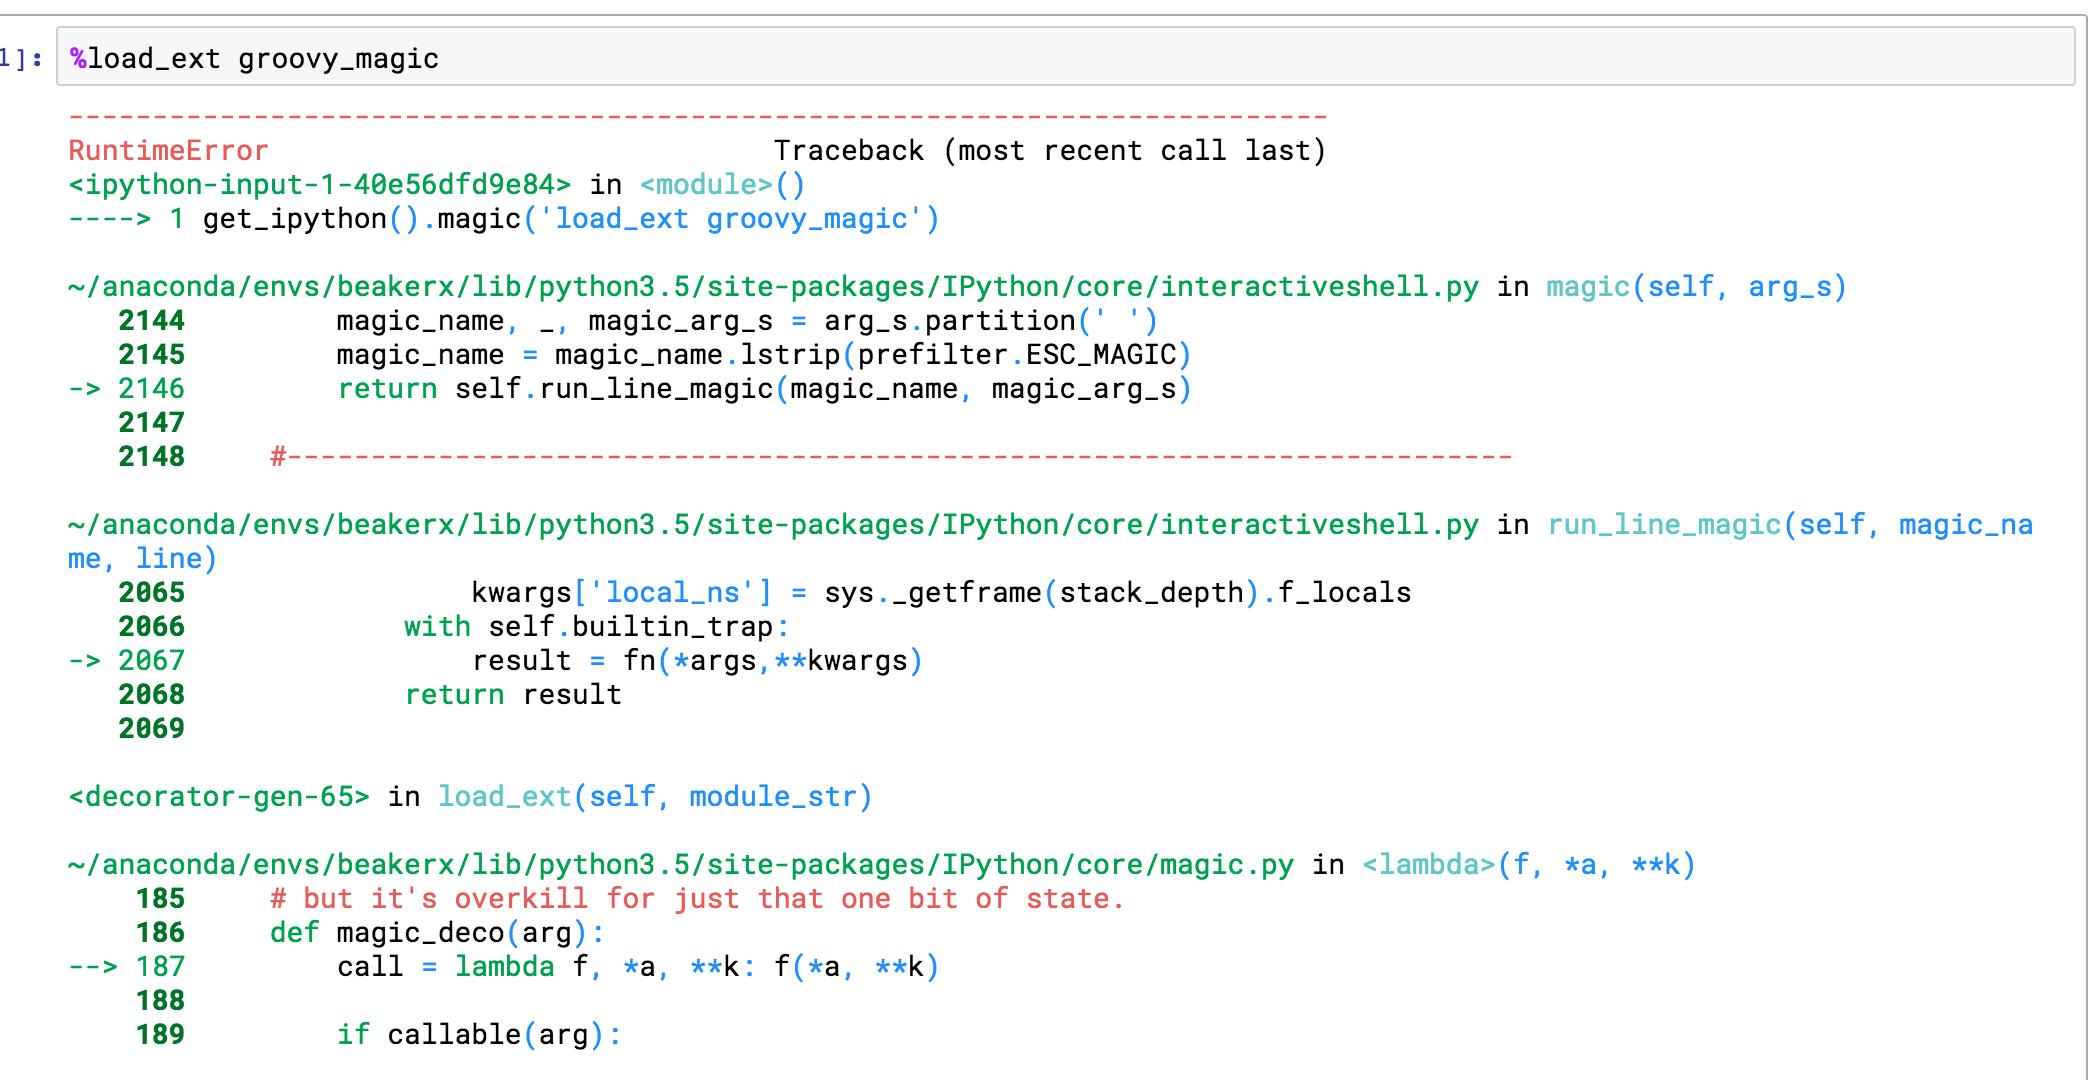 Python Magic to run Groovy broken · Issue #5677 · twosigma